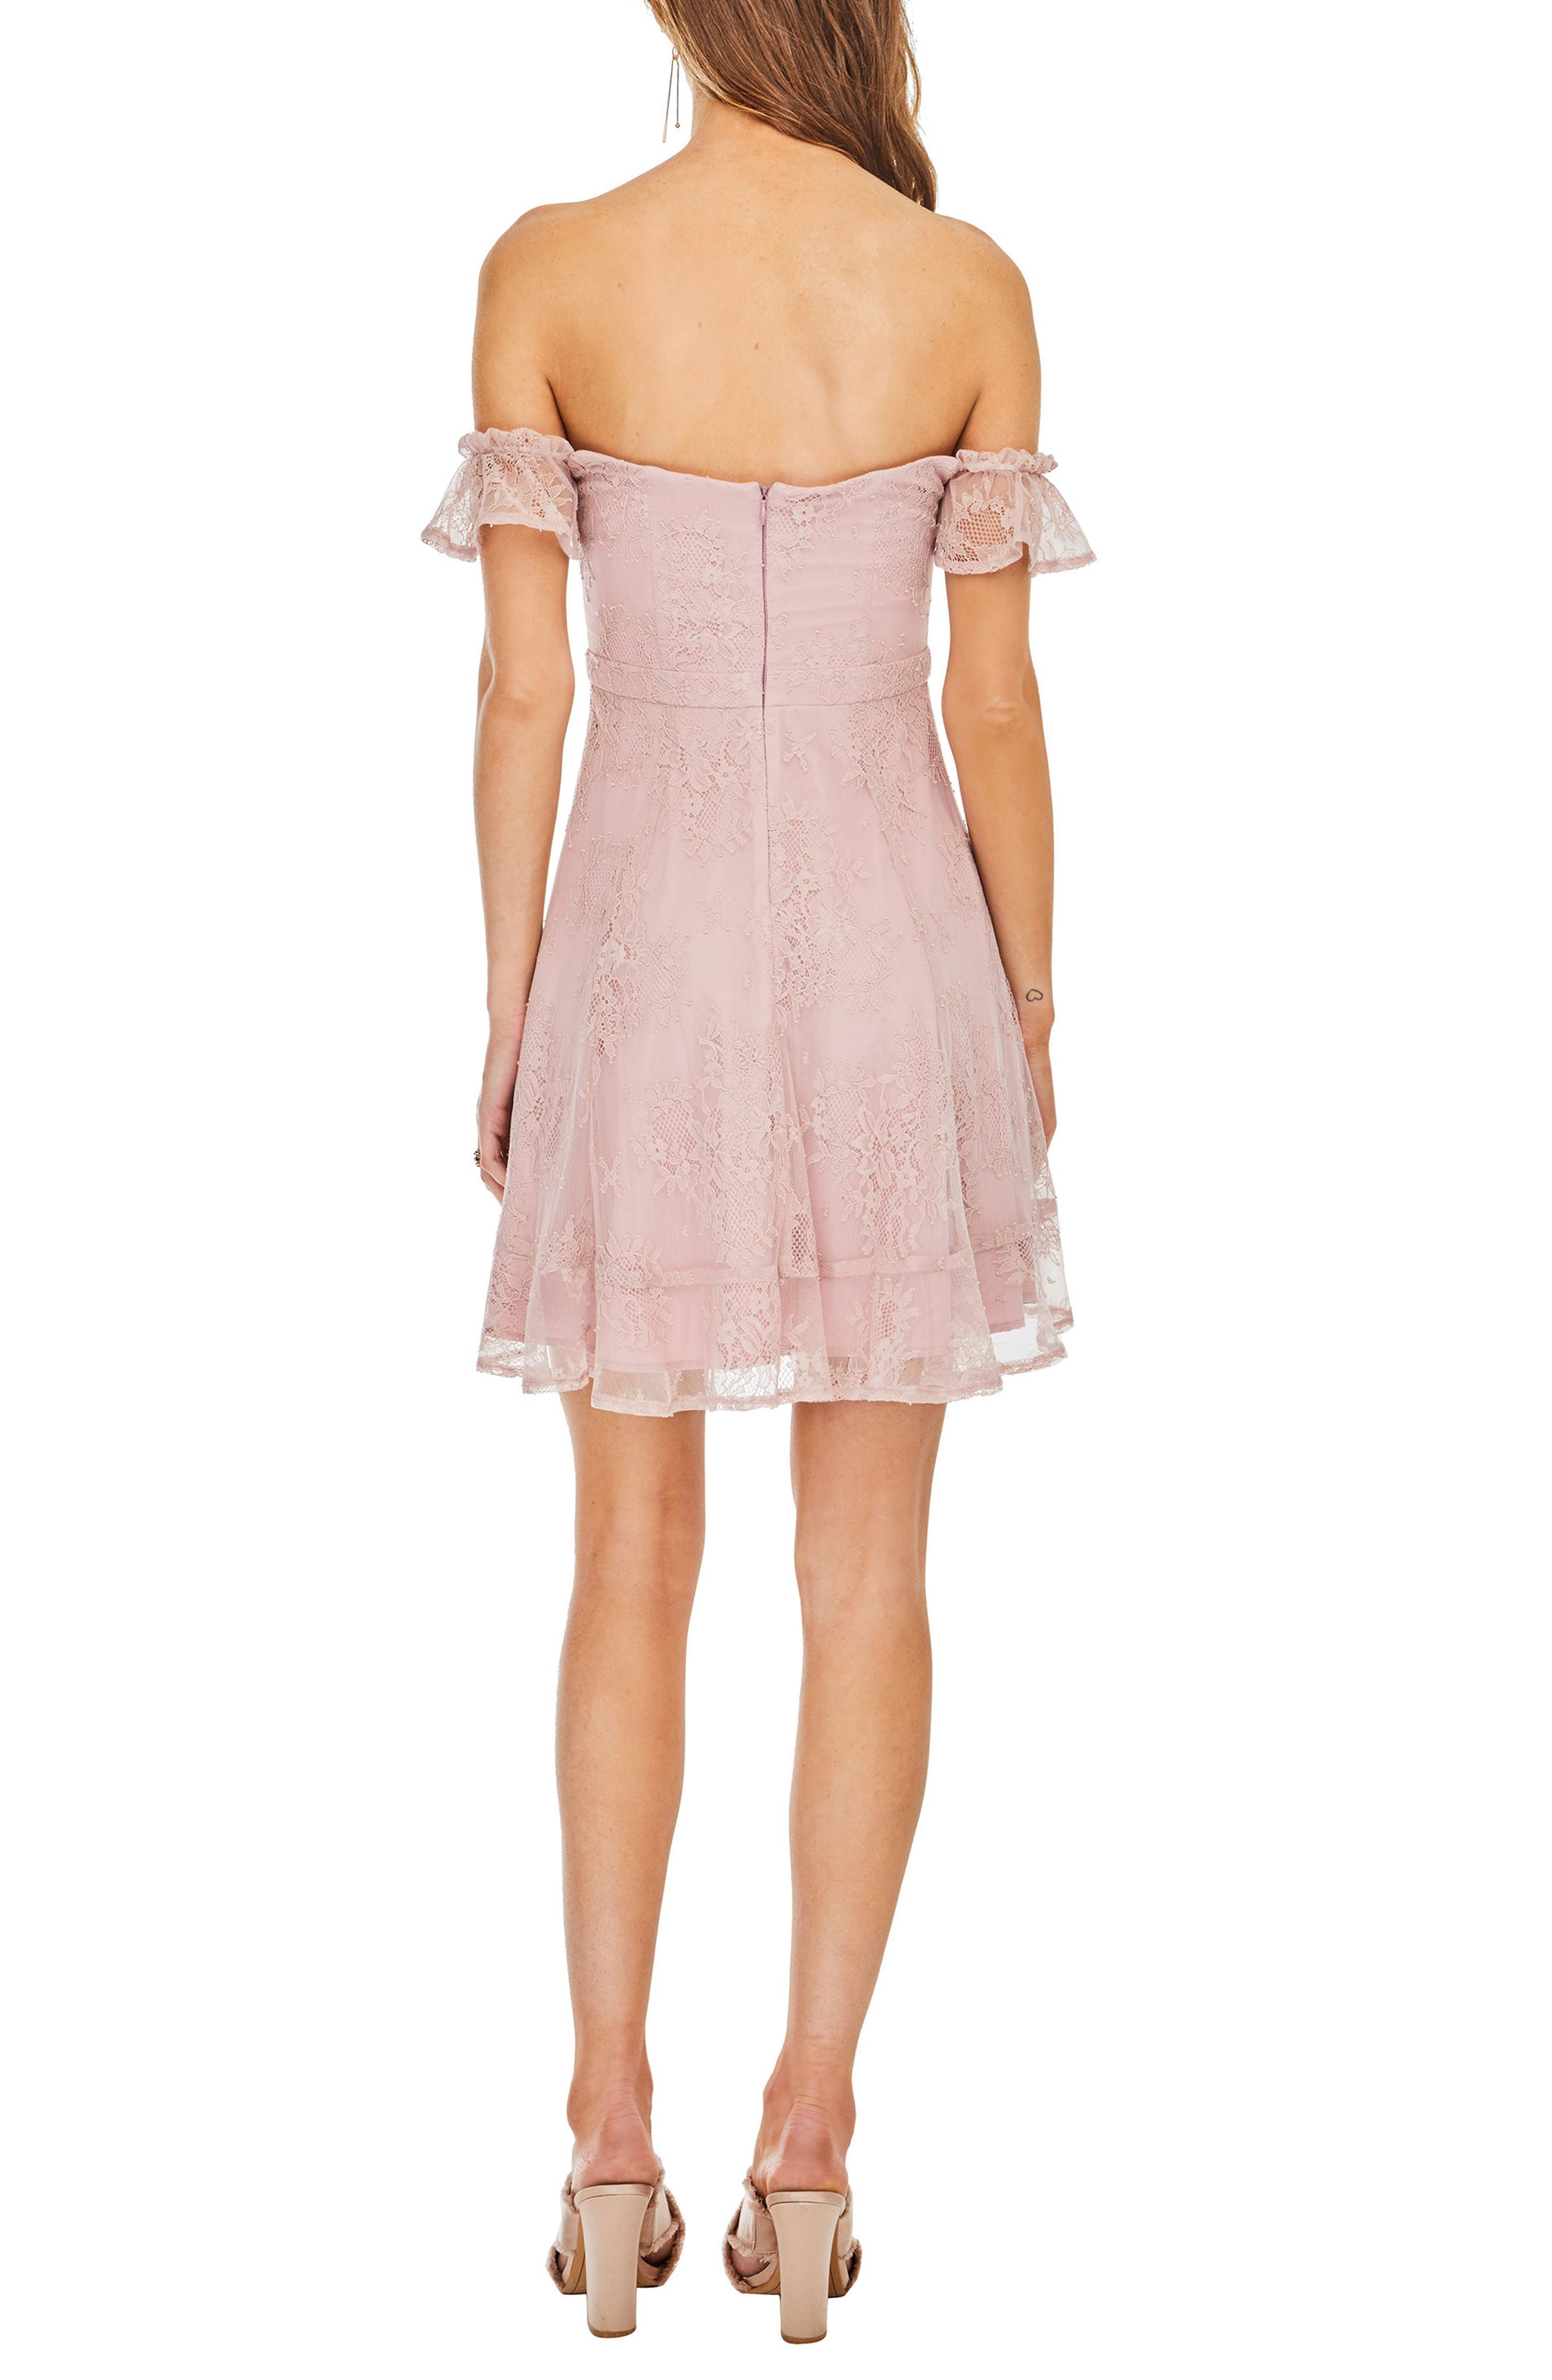 Poppy Off the Shoulder Dress,                             Alternate thumbnail 2, color,                             650